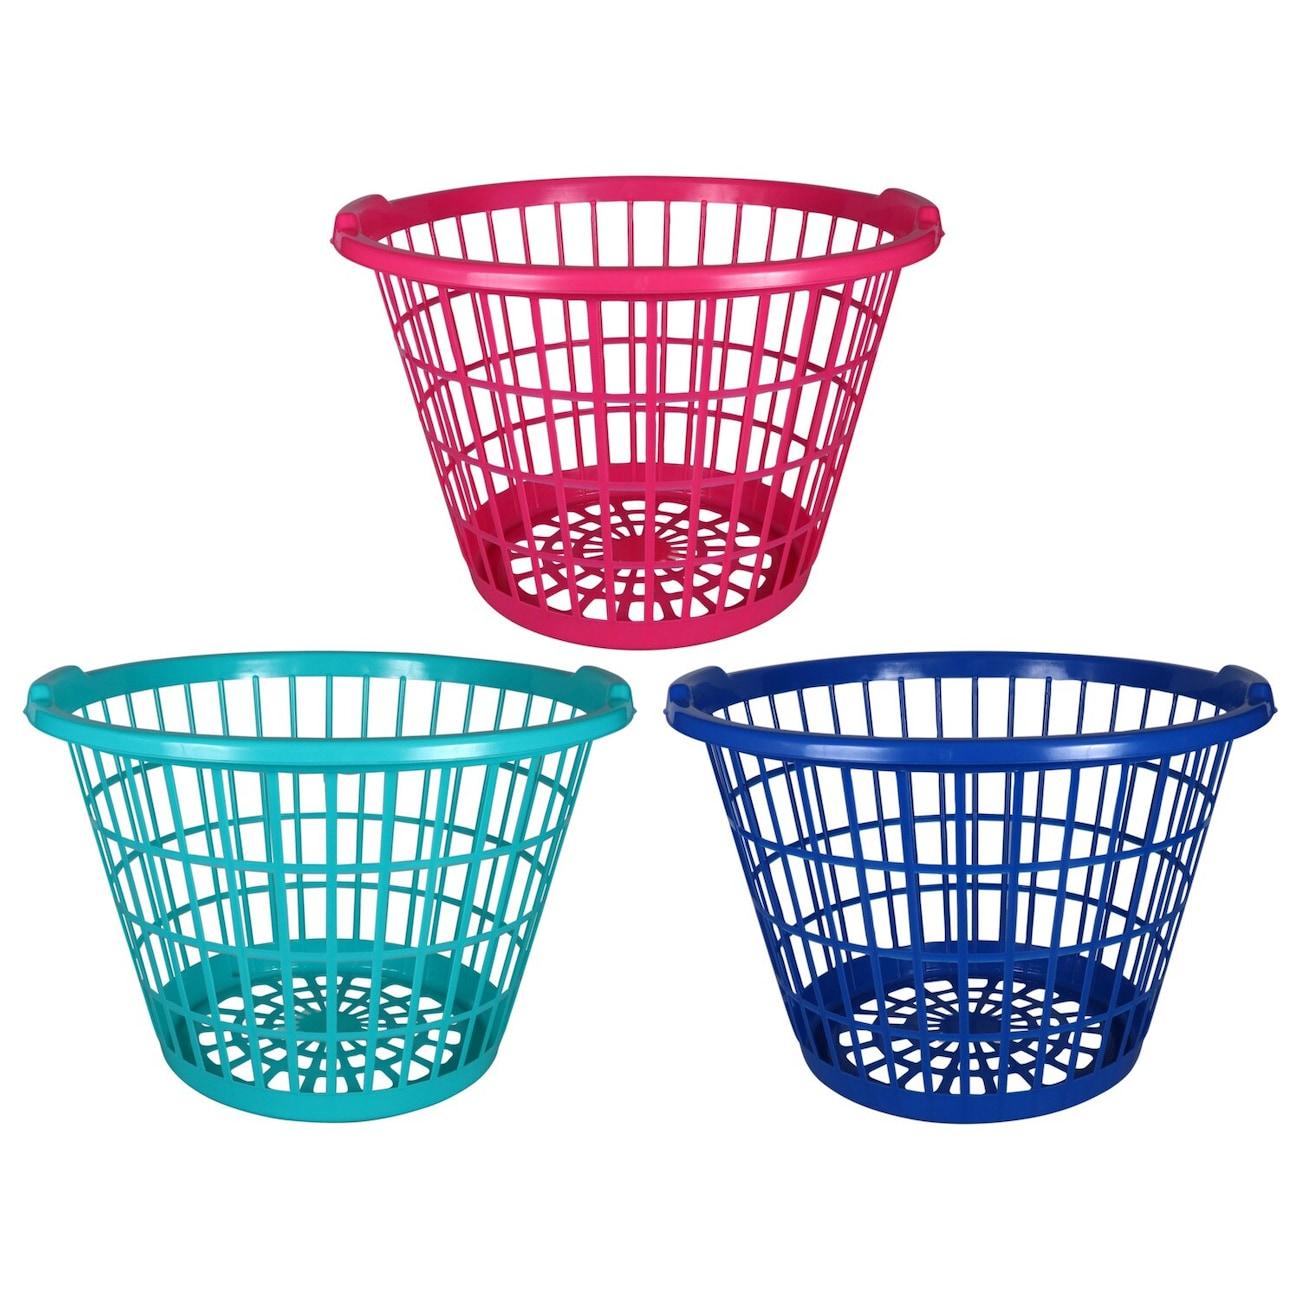 Green Plastic Baskets Dollar Tree Inc